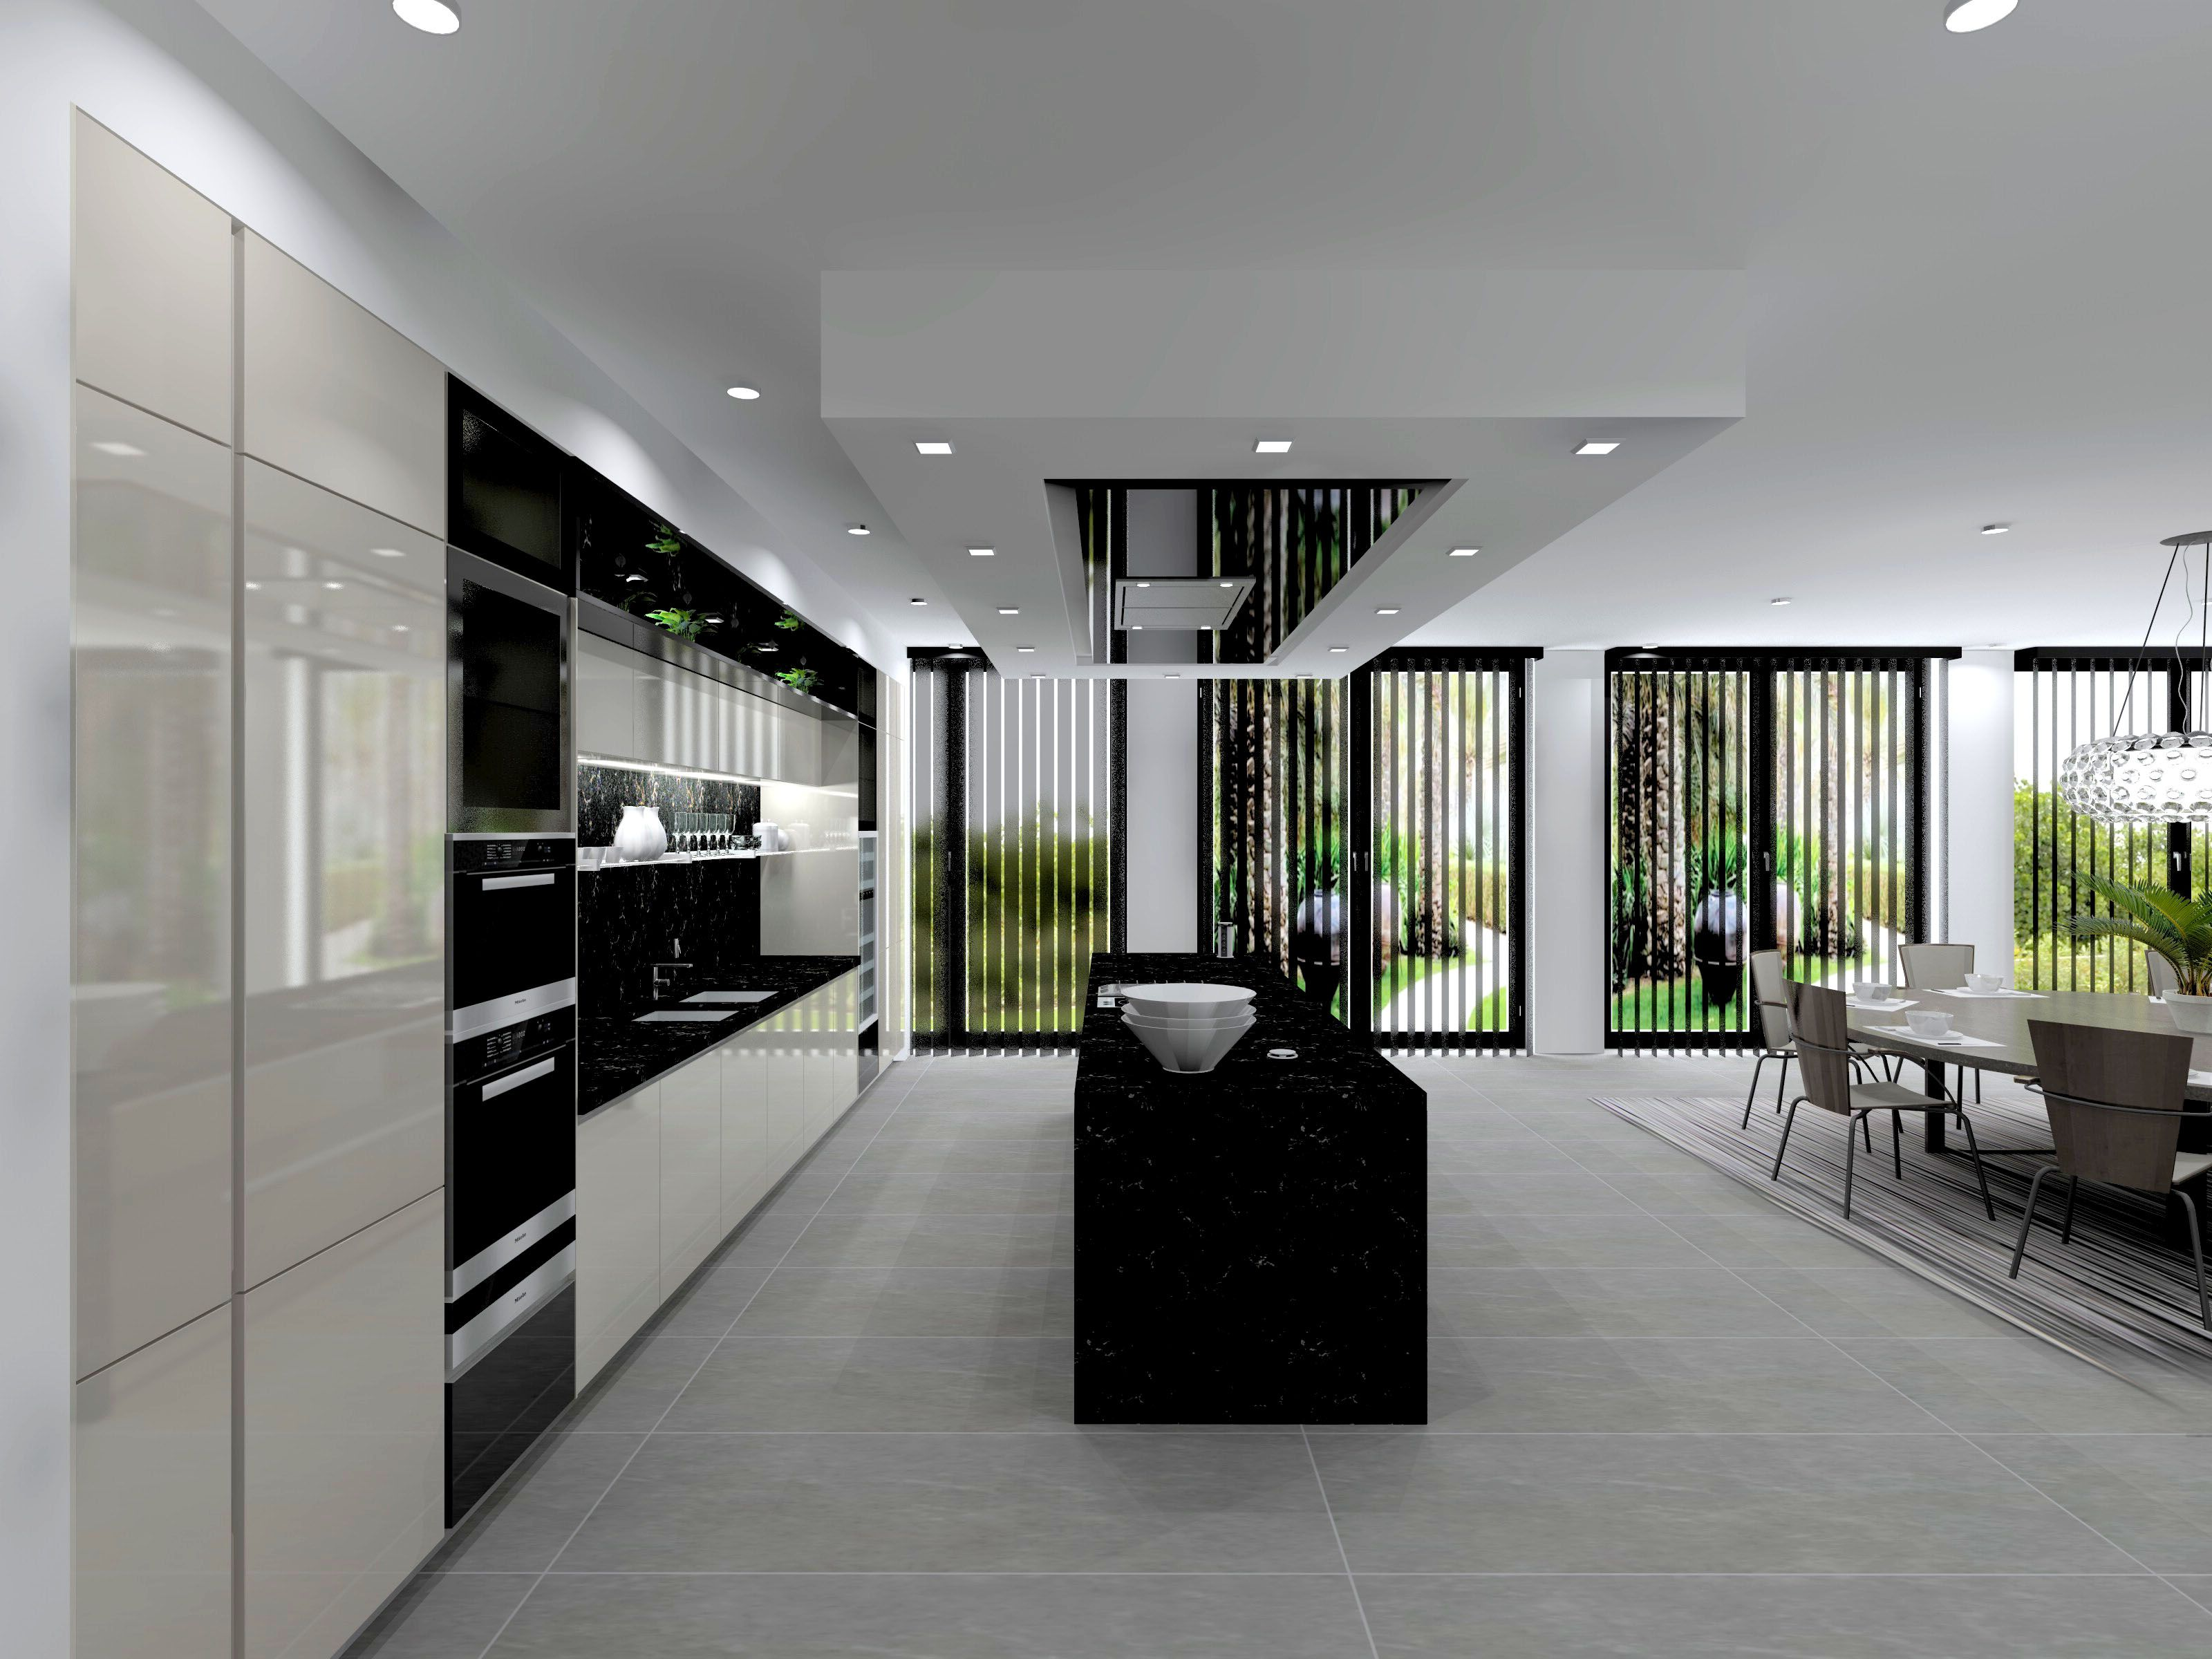 Ultra-modern kitchen | Modern house design, House design ... on Ultra Modern Luxury Modern Kitchen Designs  id=54843